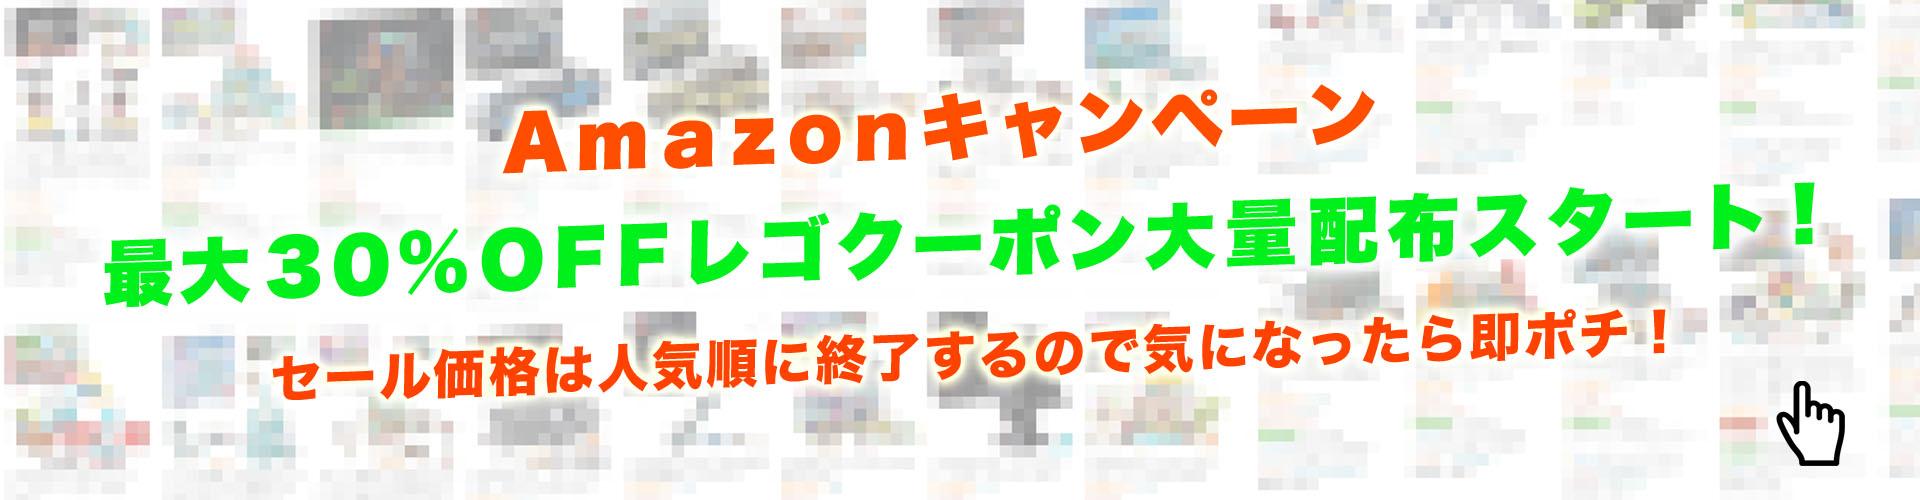 Amazonレゴ(LEGO)セール情報【毎日何度も更新】楽天とレゴランド公式ショップ情報もあり